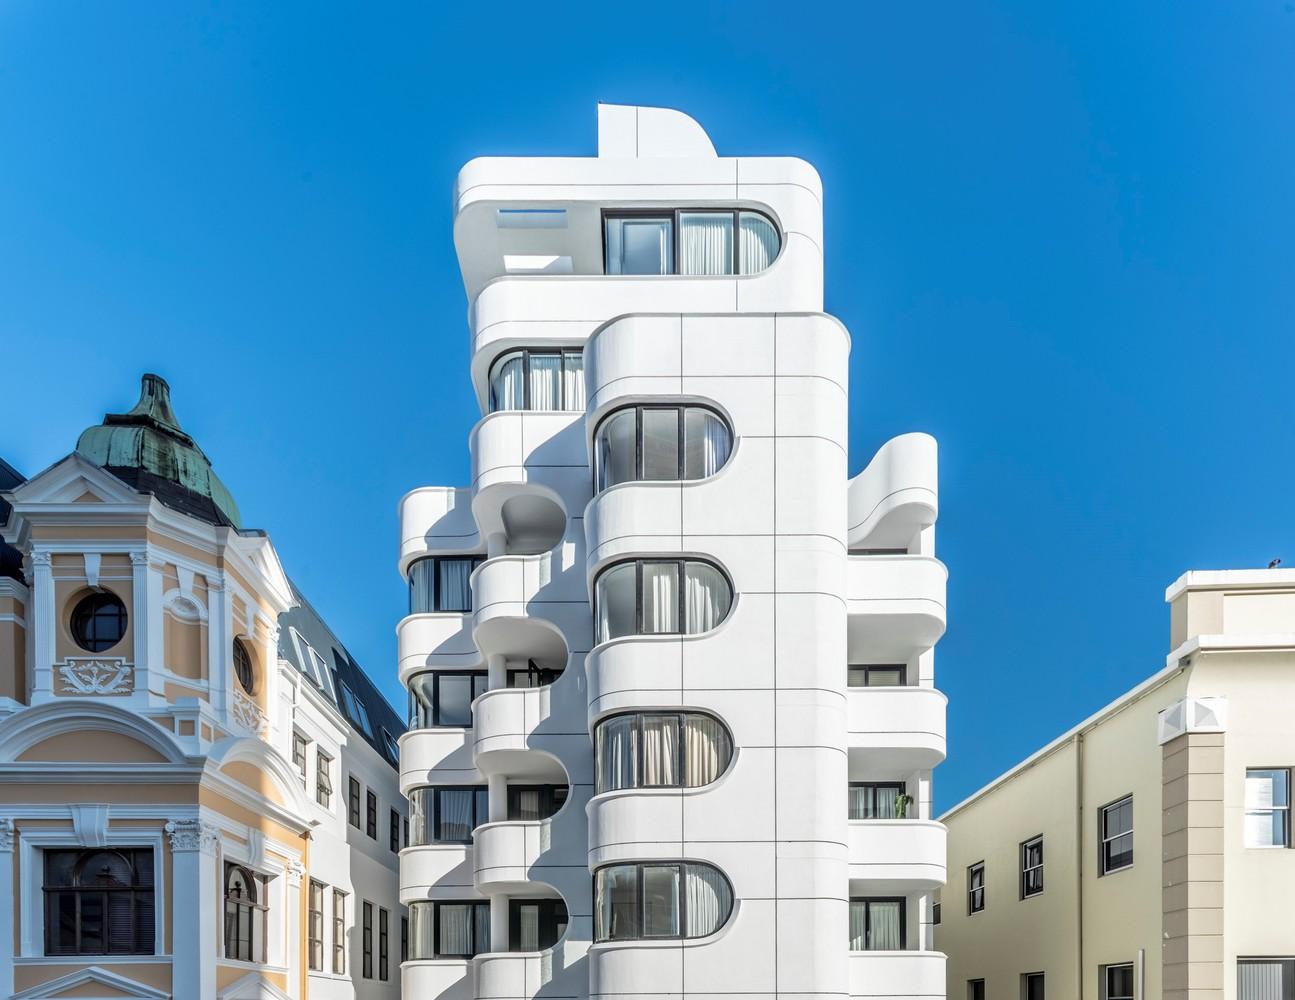 Tuynhuys Apartment Building / Robert Silke & Partners